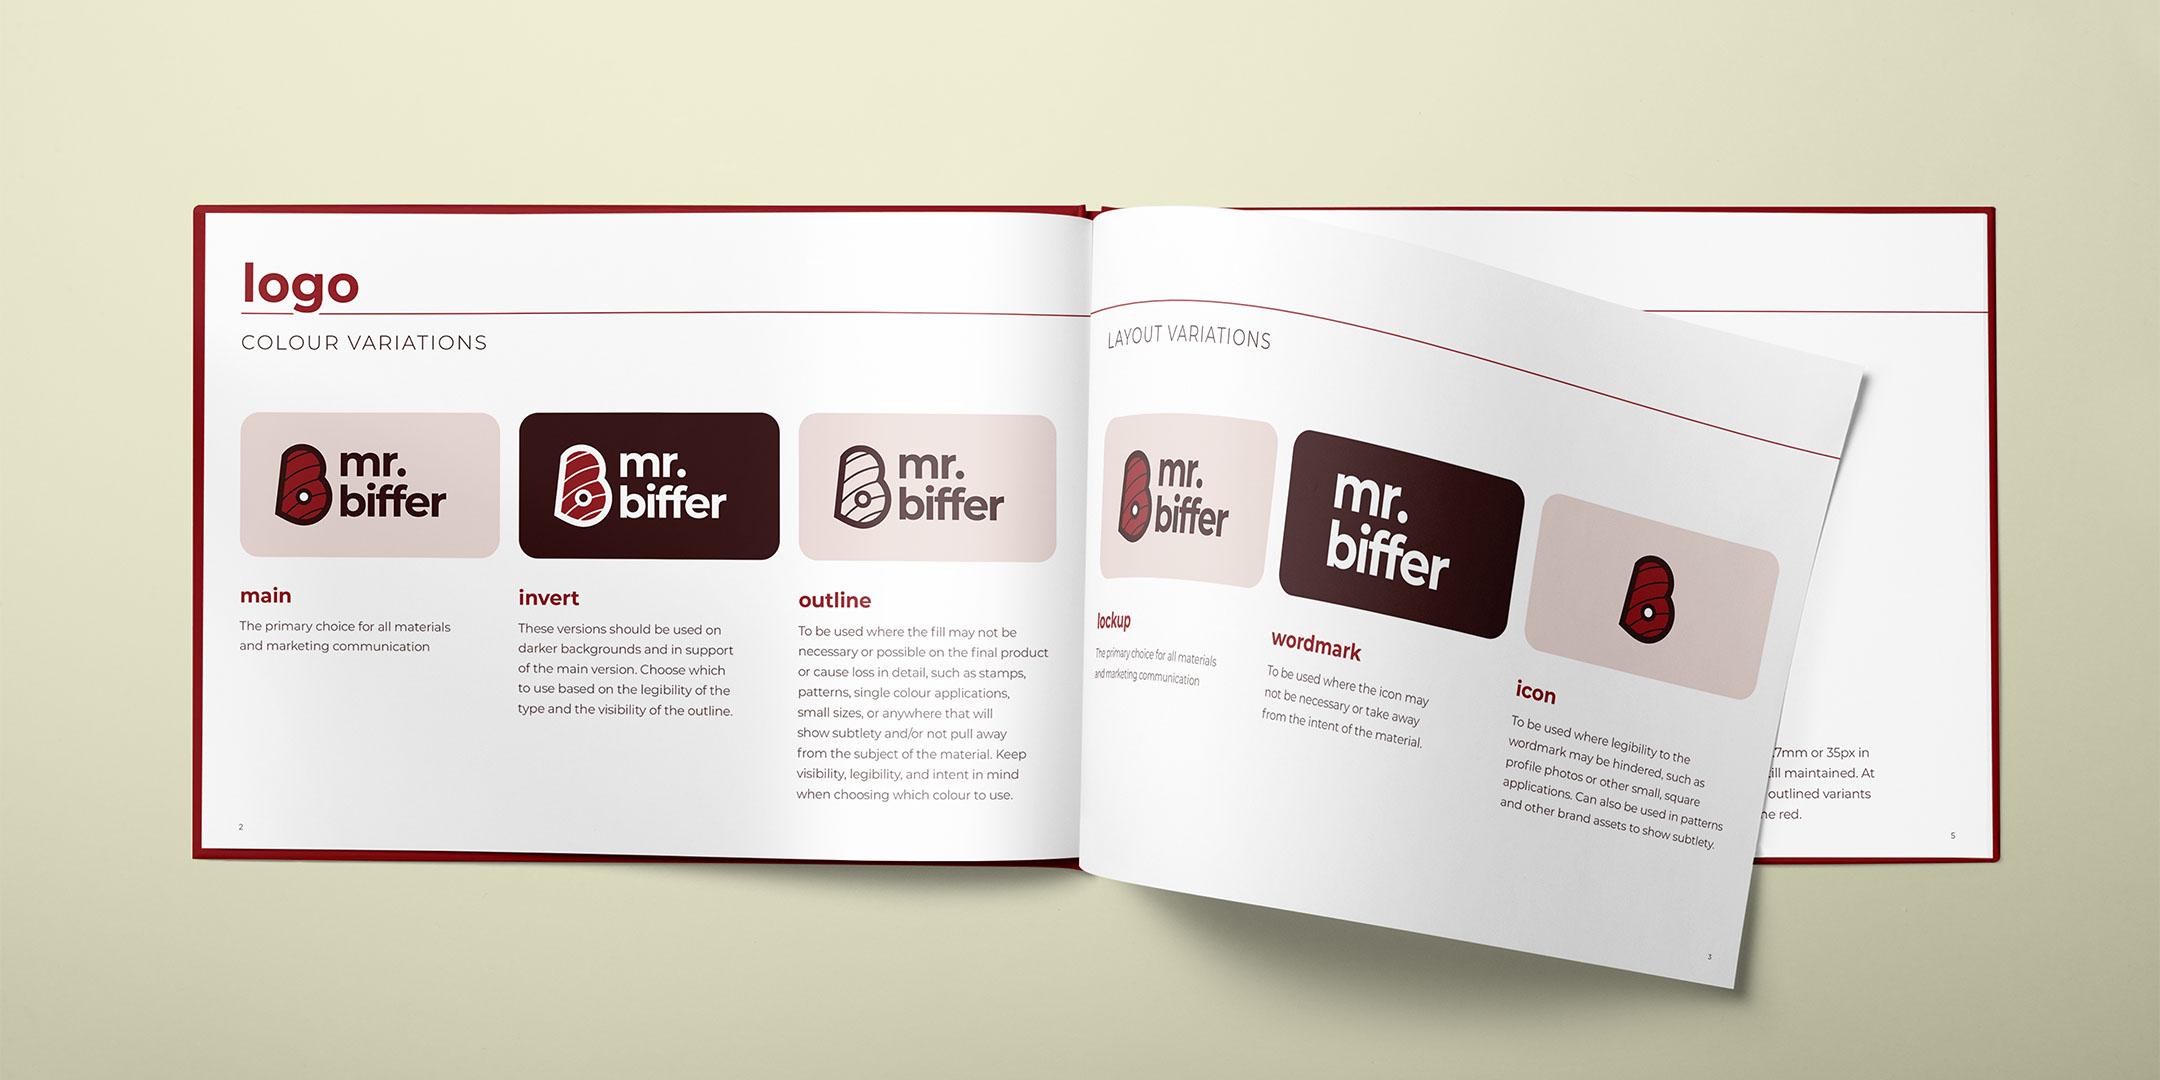 Mr. Biffer brand identity manual showing logo variants